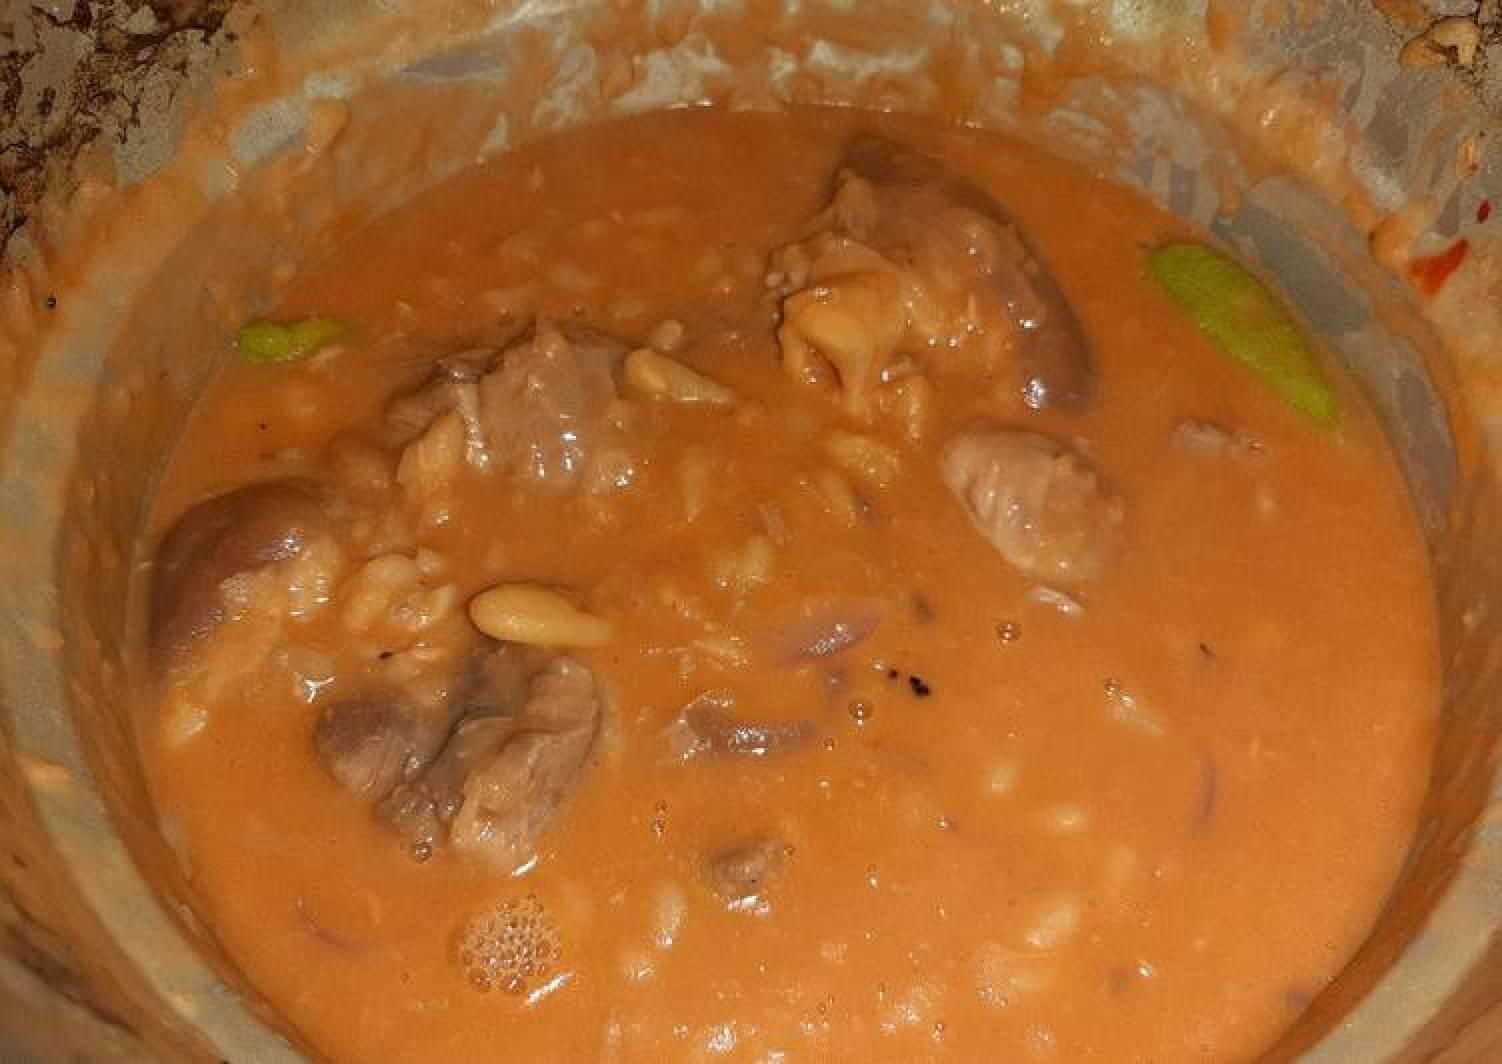 Bitsuelas (beans)